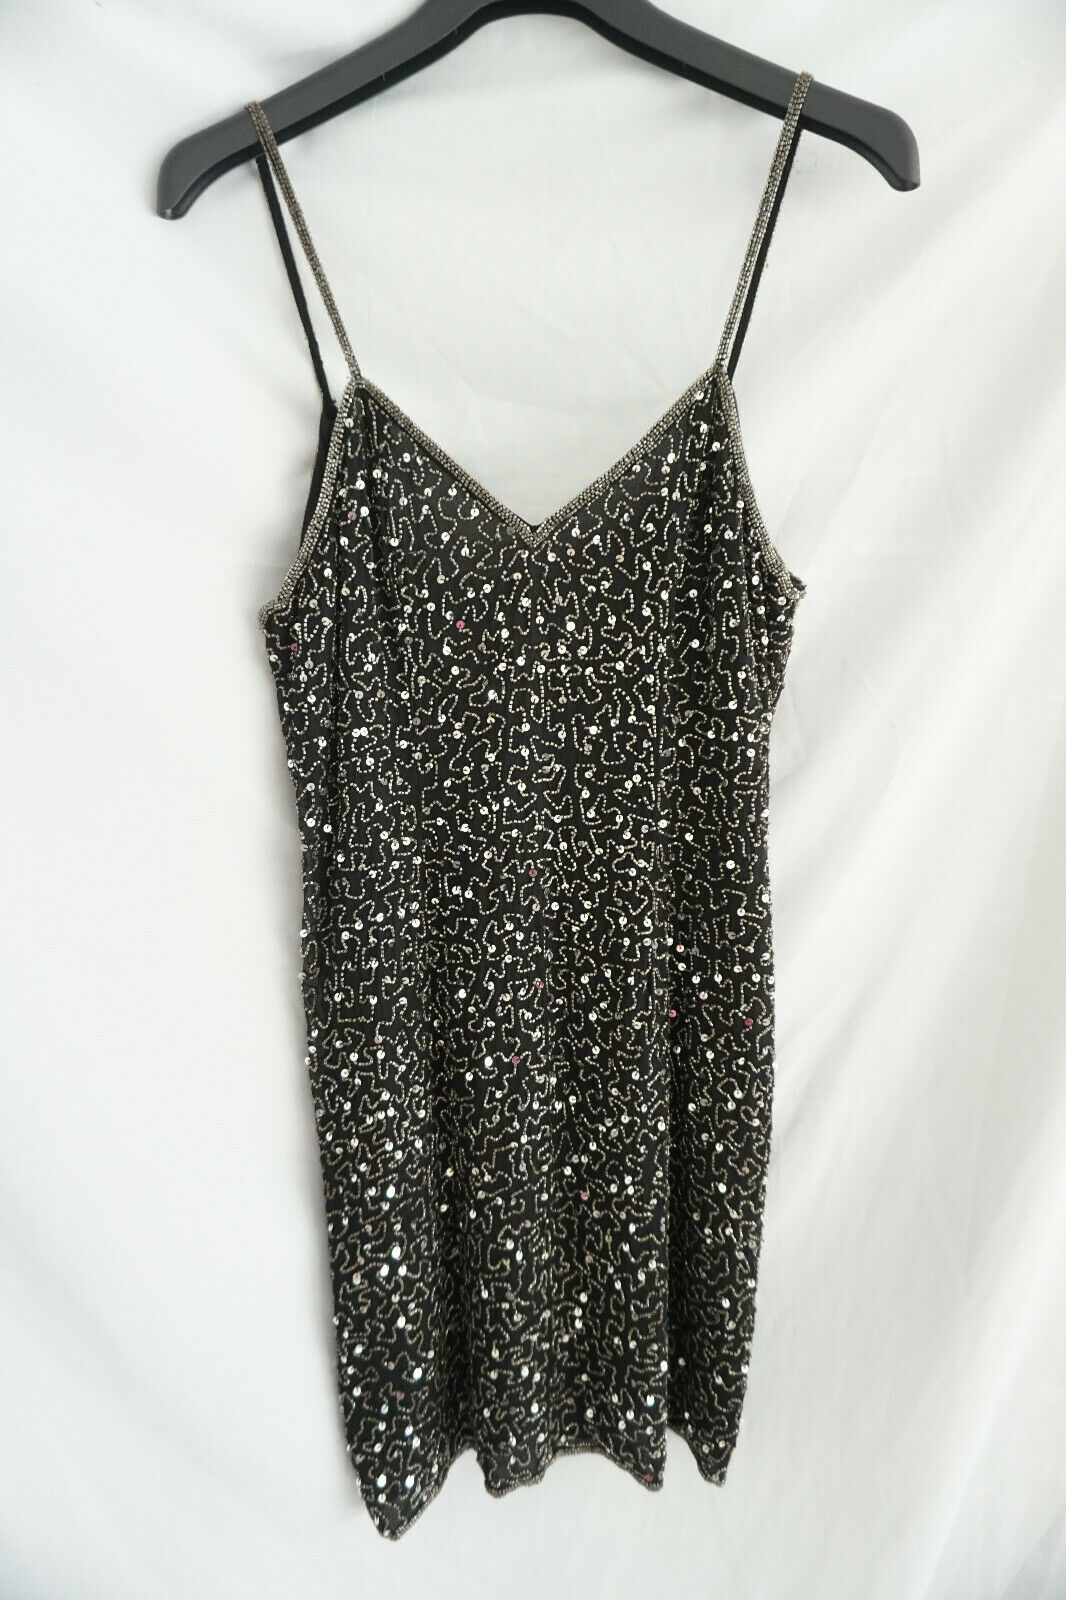 Denise Elle / Abendkleid Trägerkleid / Perlen Verziert Gr 38